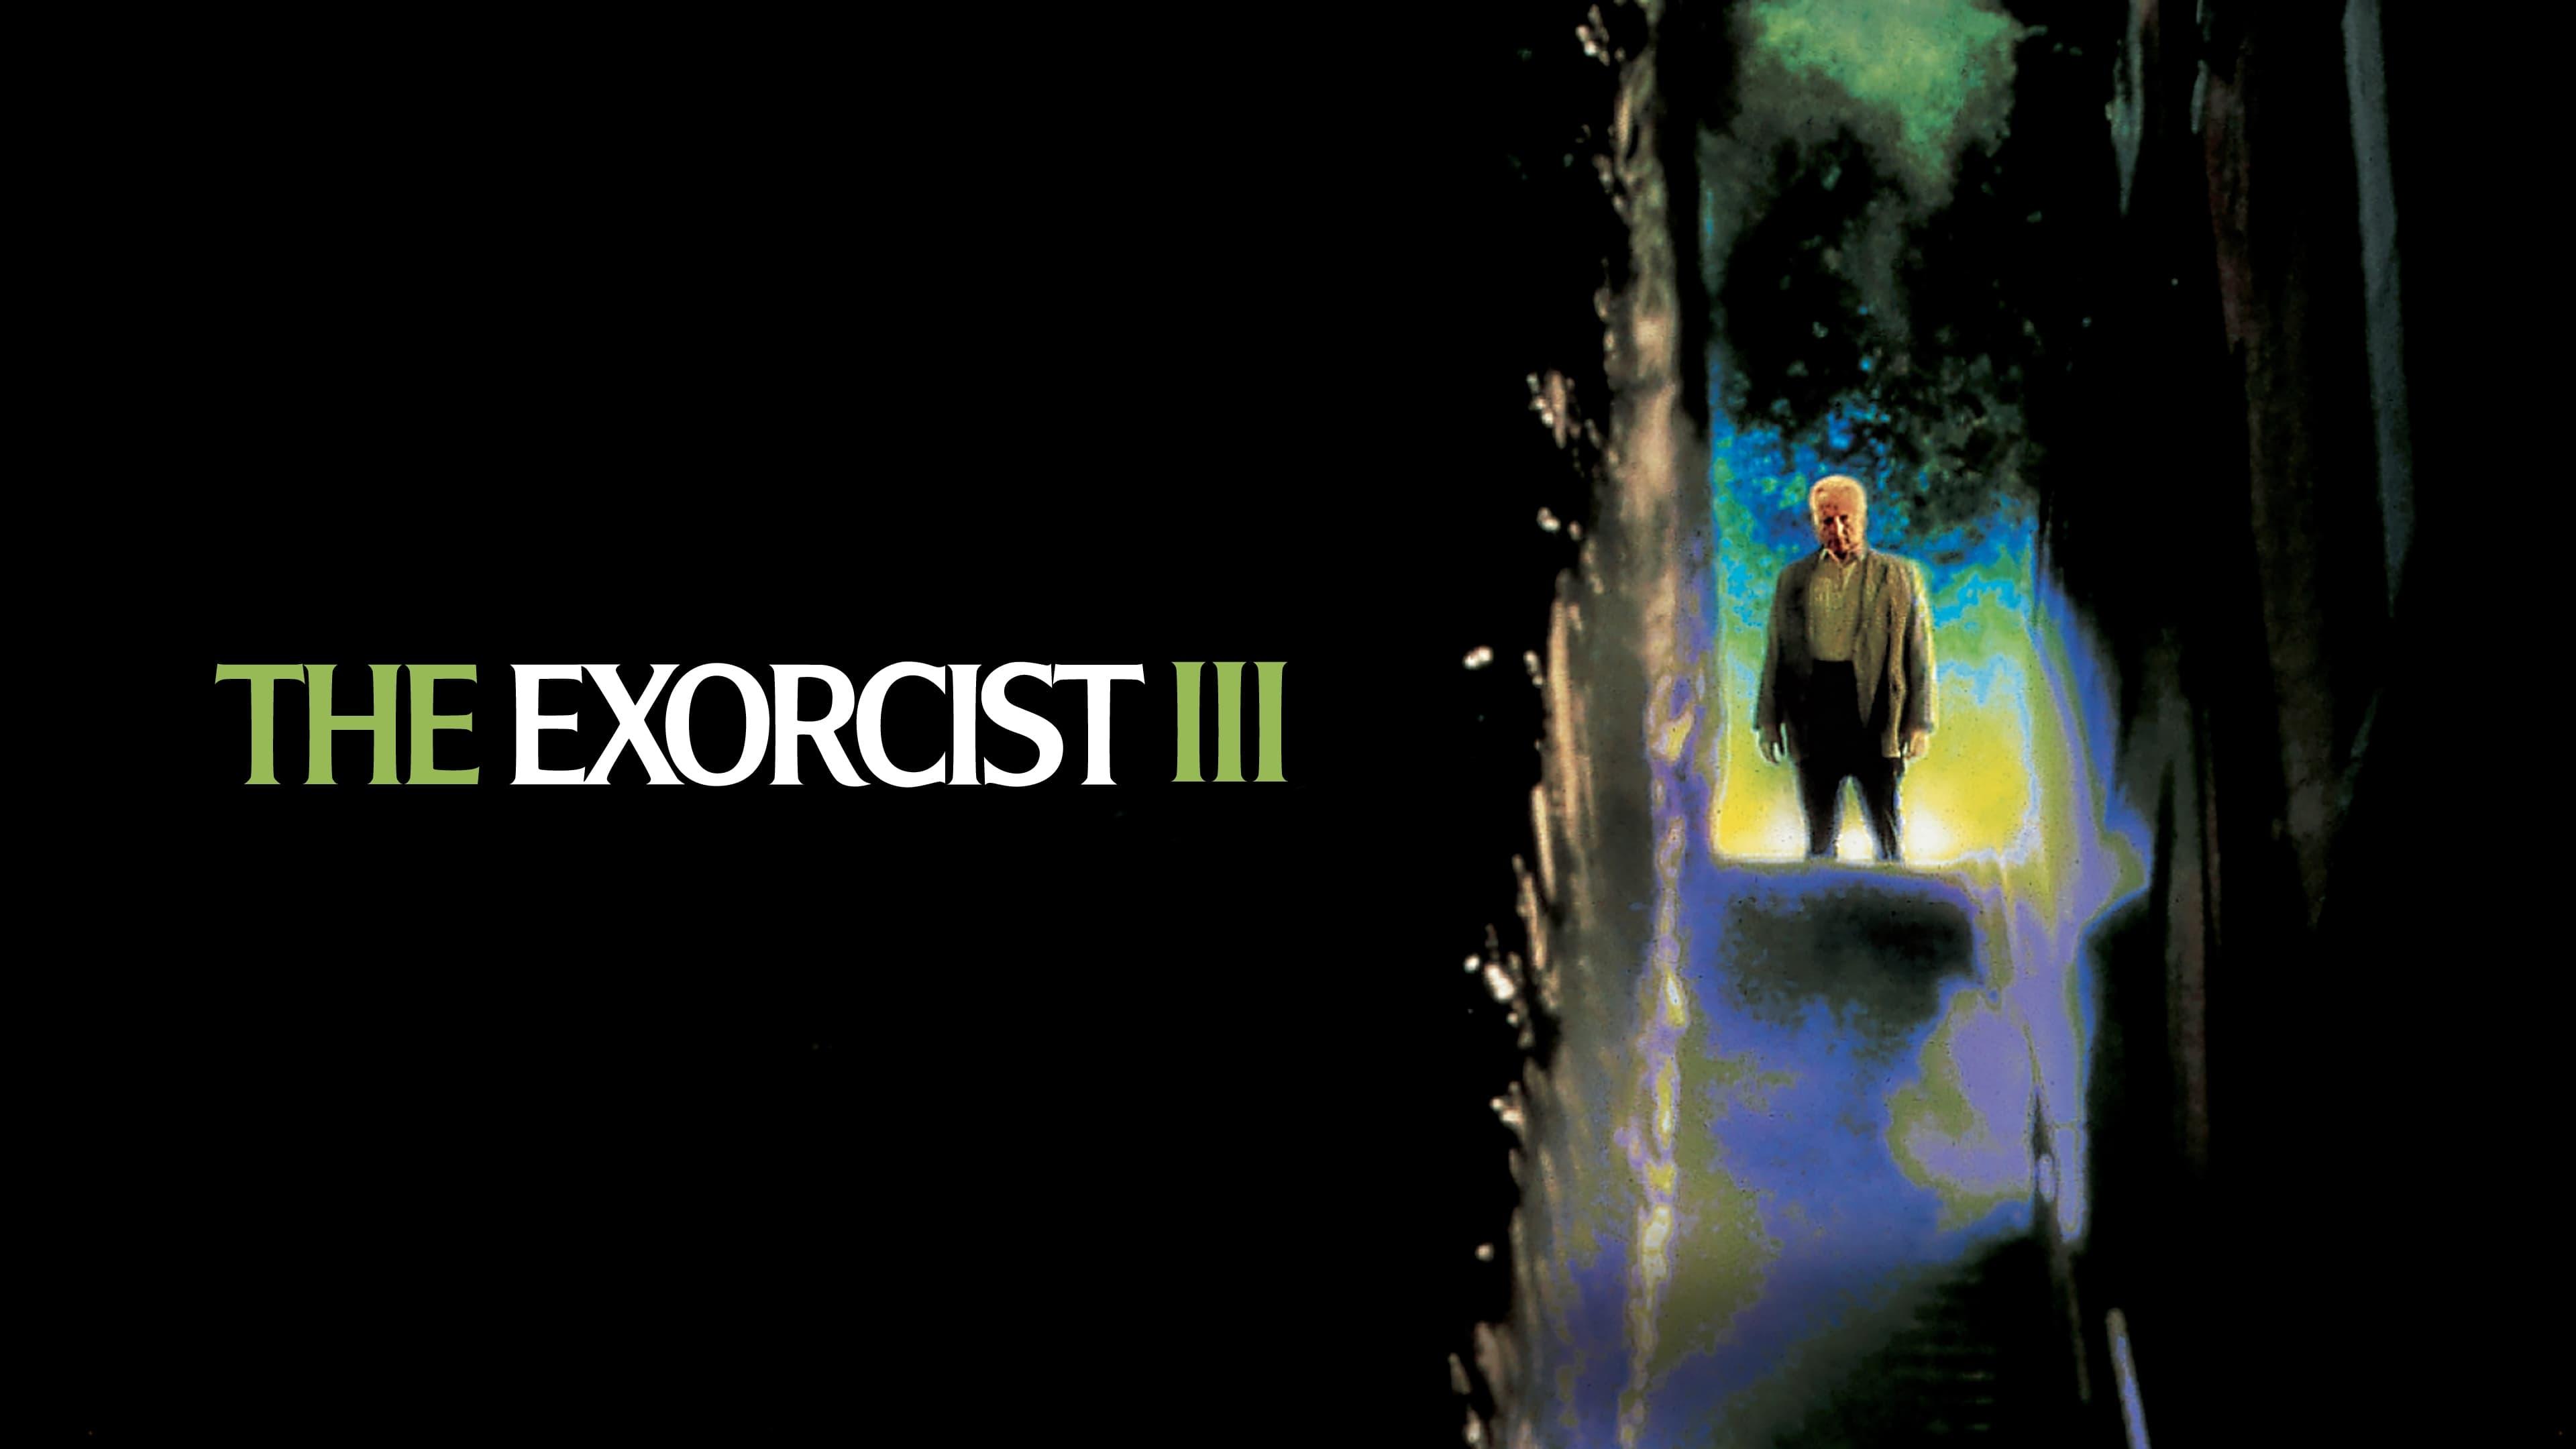 The Exorcist III Movie